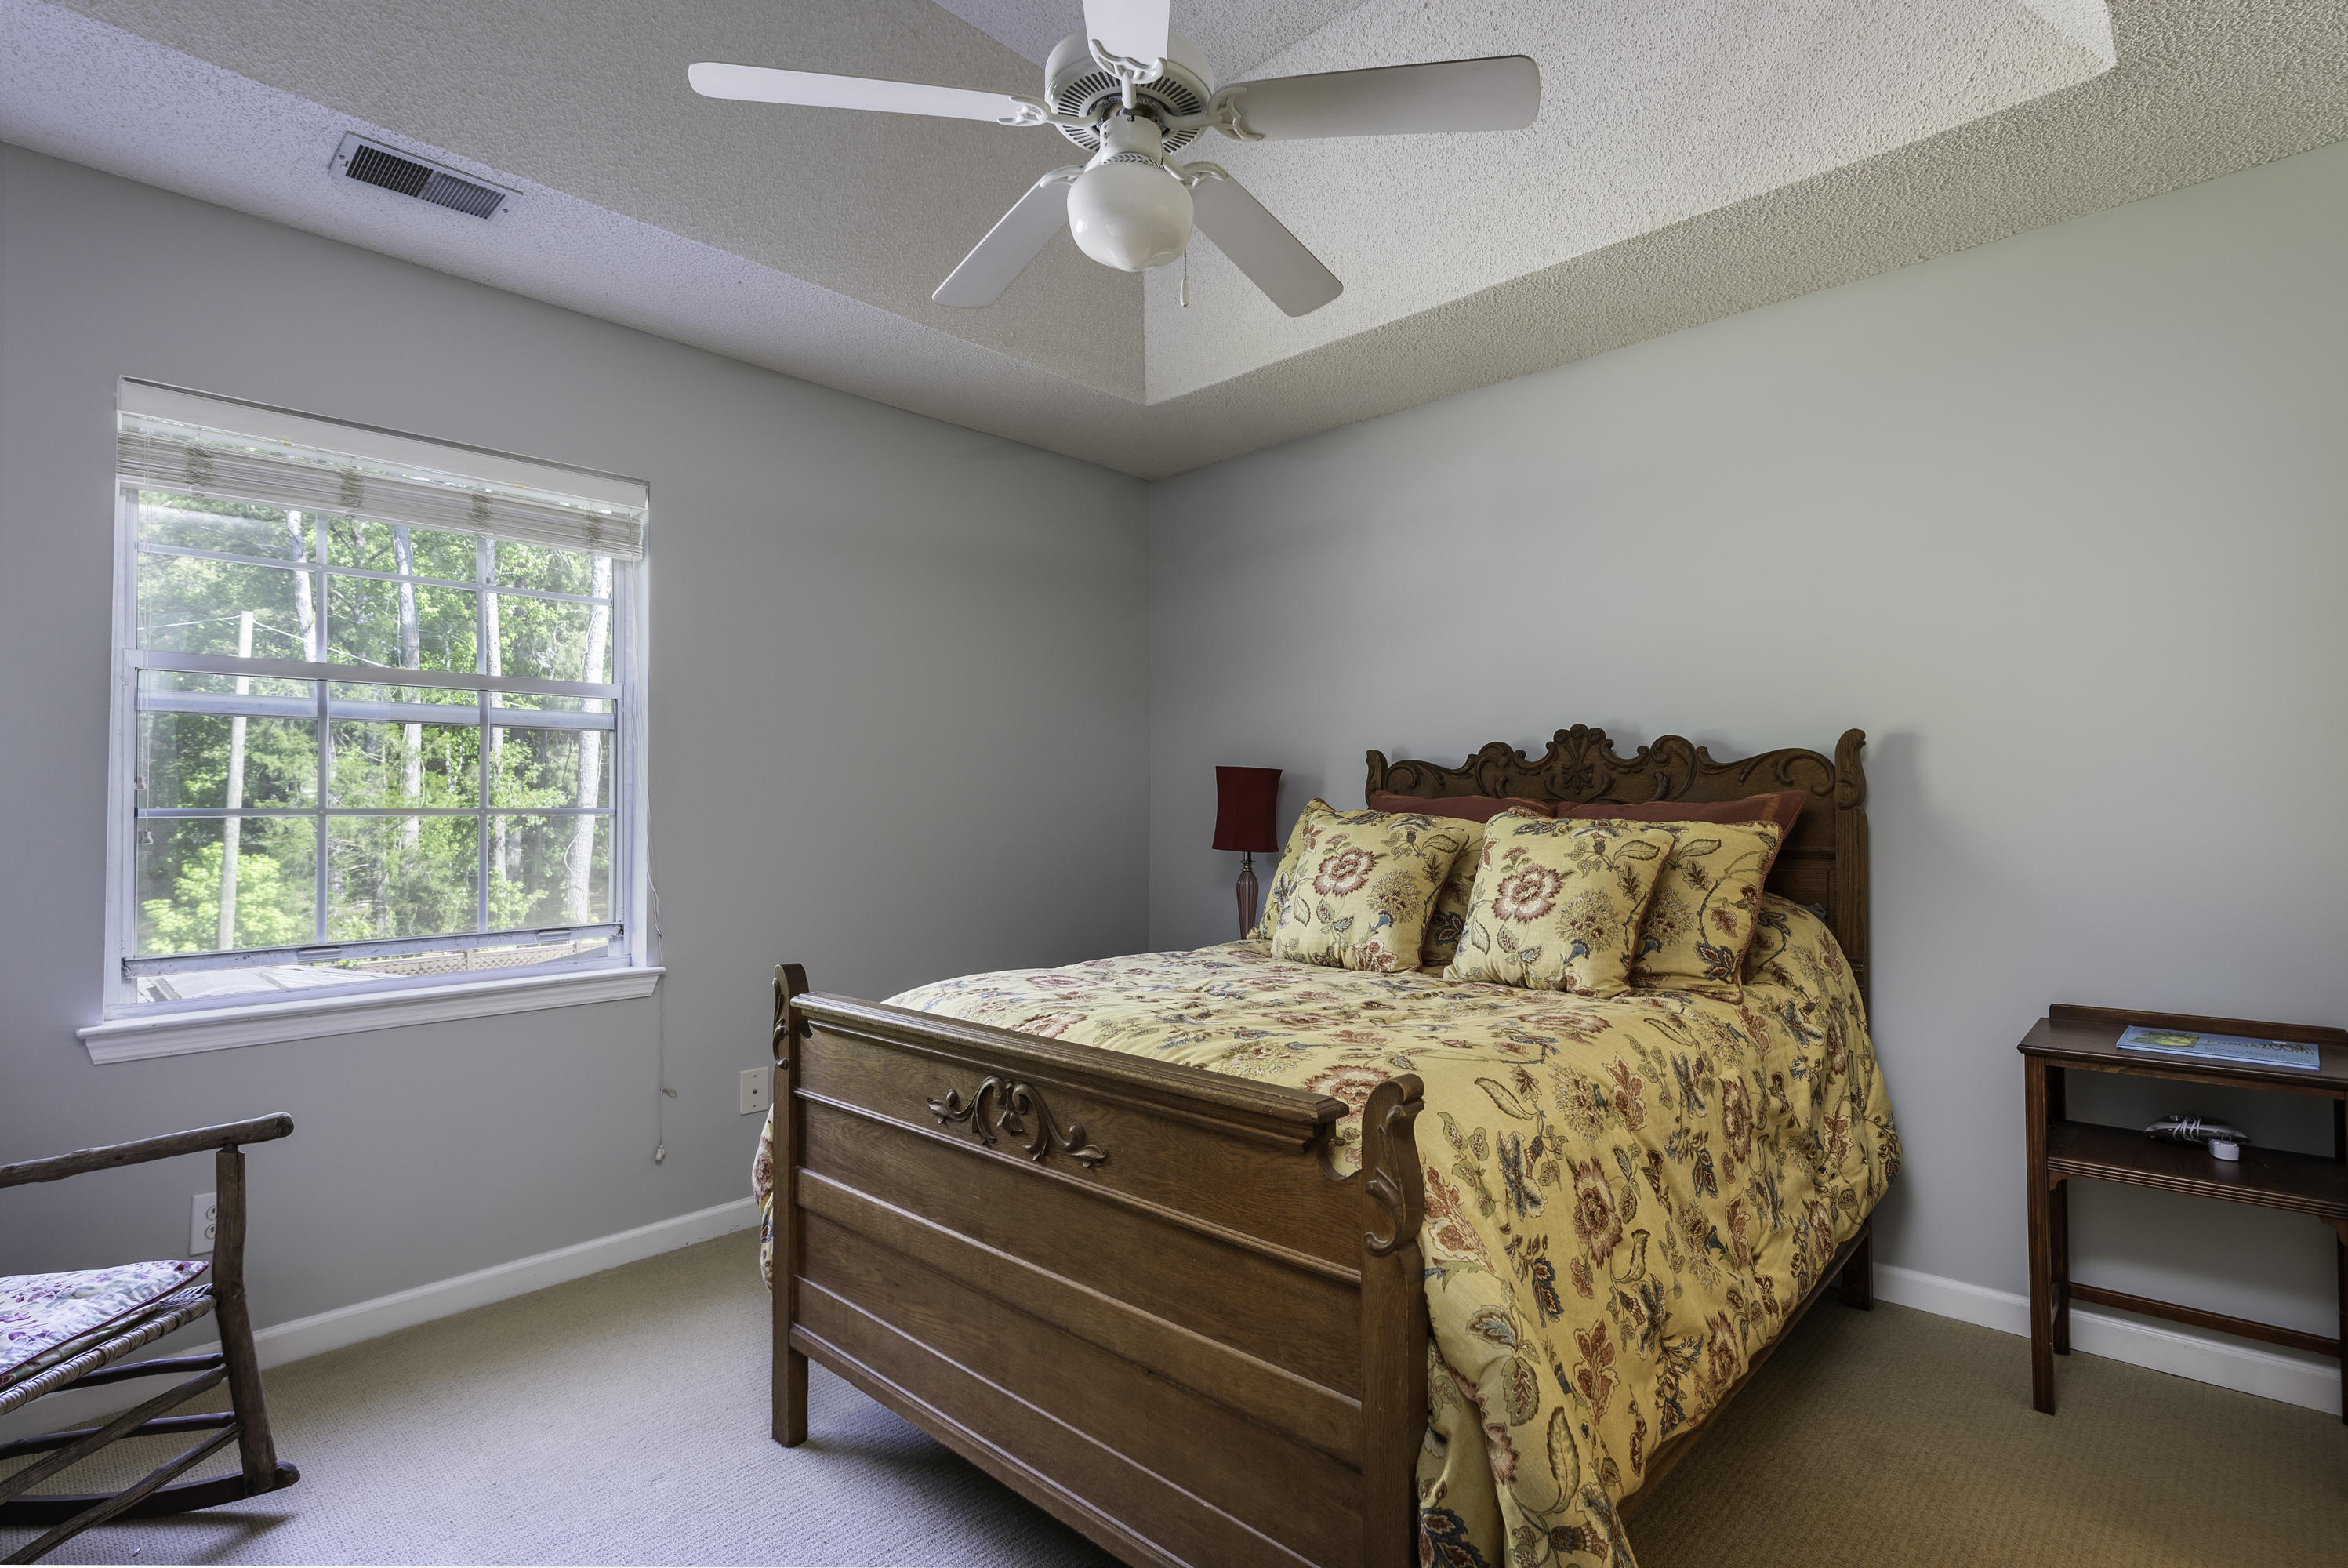 Chadbury Village Homes For Sale - 2333 Chadbury, Mount Pleasant, SC - 9